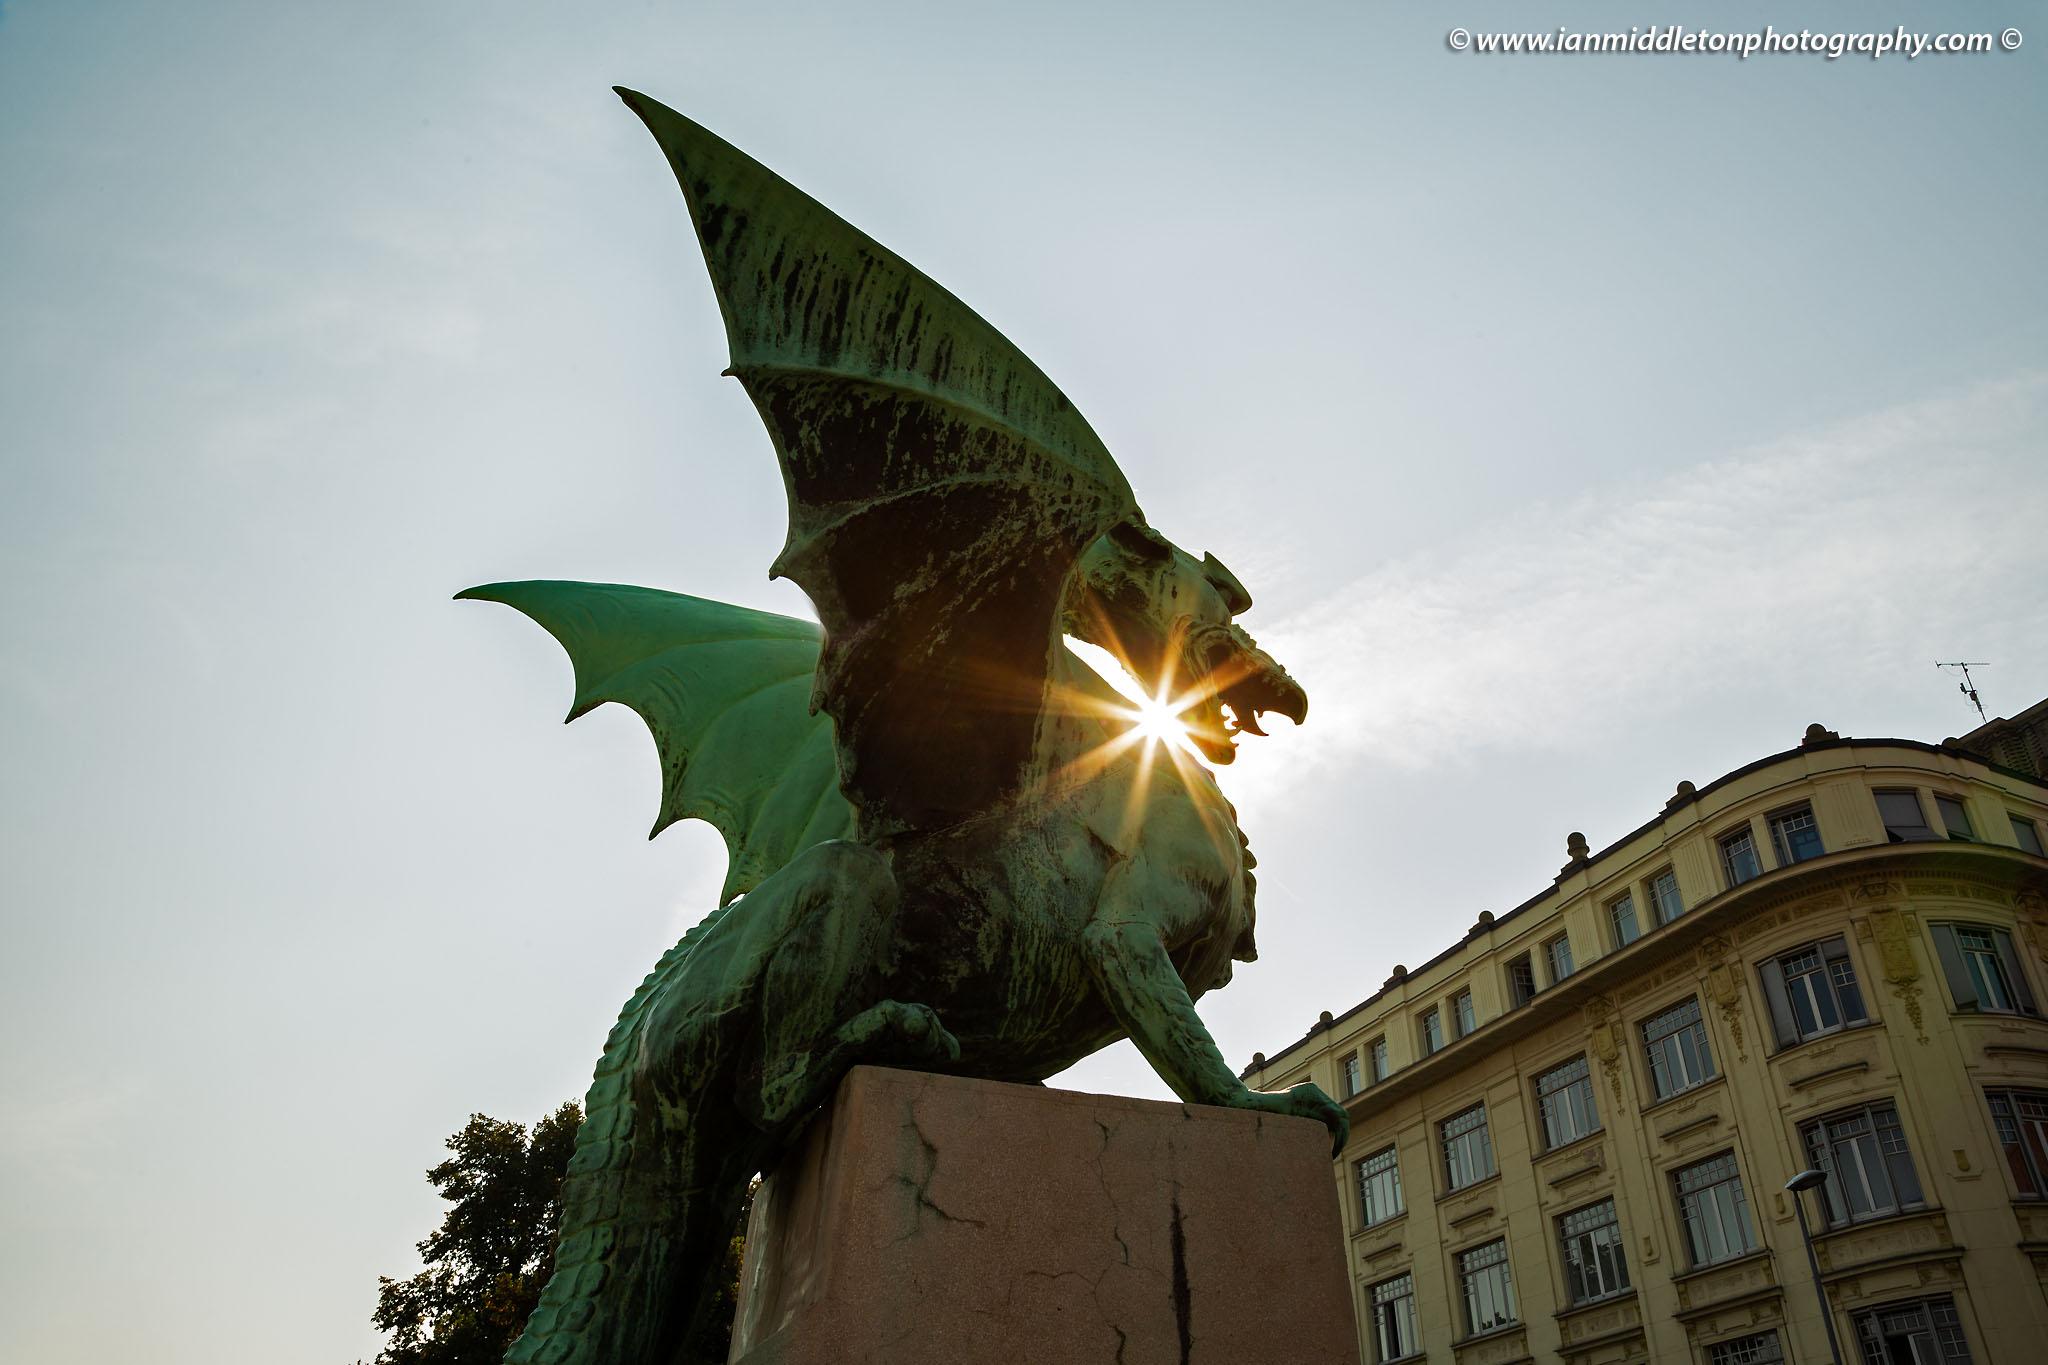 Sunburst through a dragon on the Dragon Bridge in Ljubljana, Slovenia.